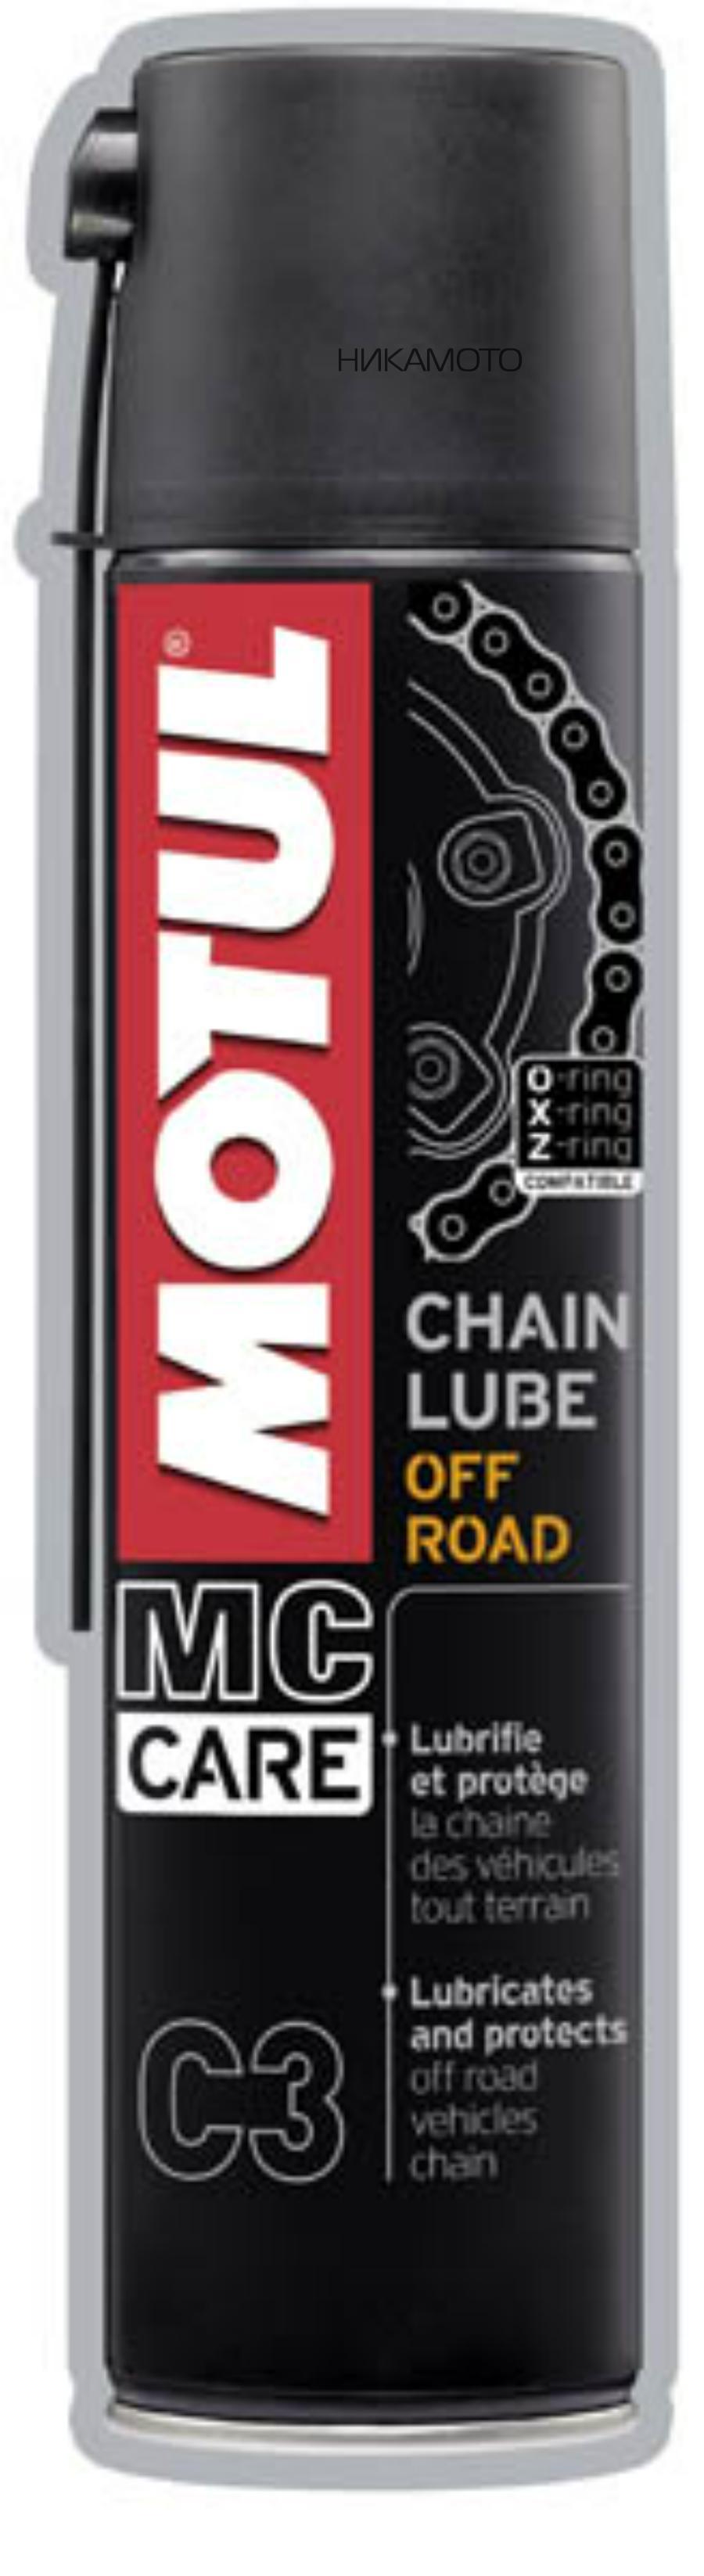 Смазка для цепи MOTUL C3 Chain Lube Off Road